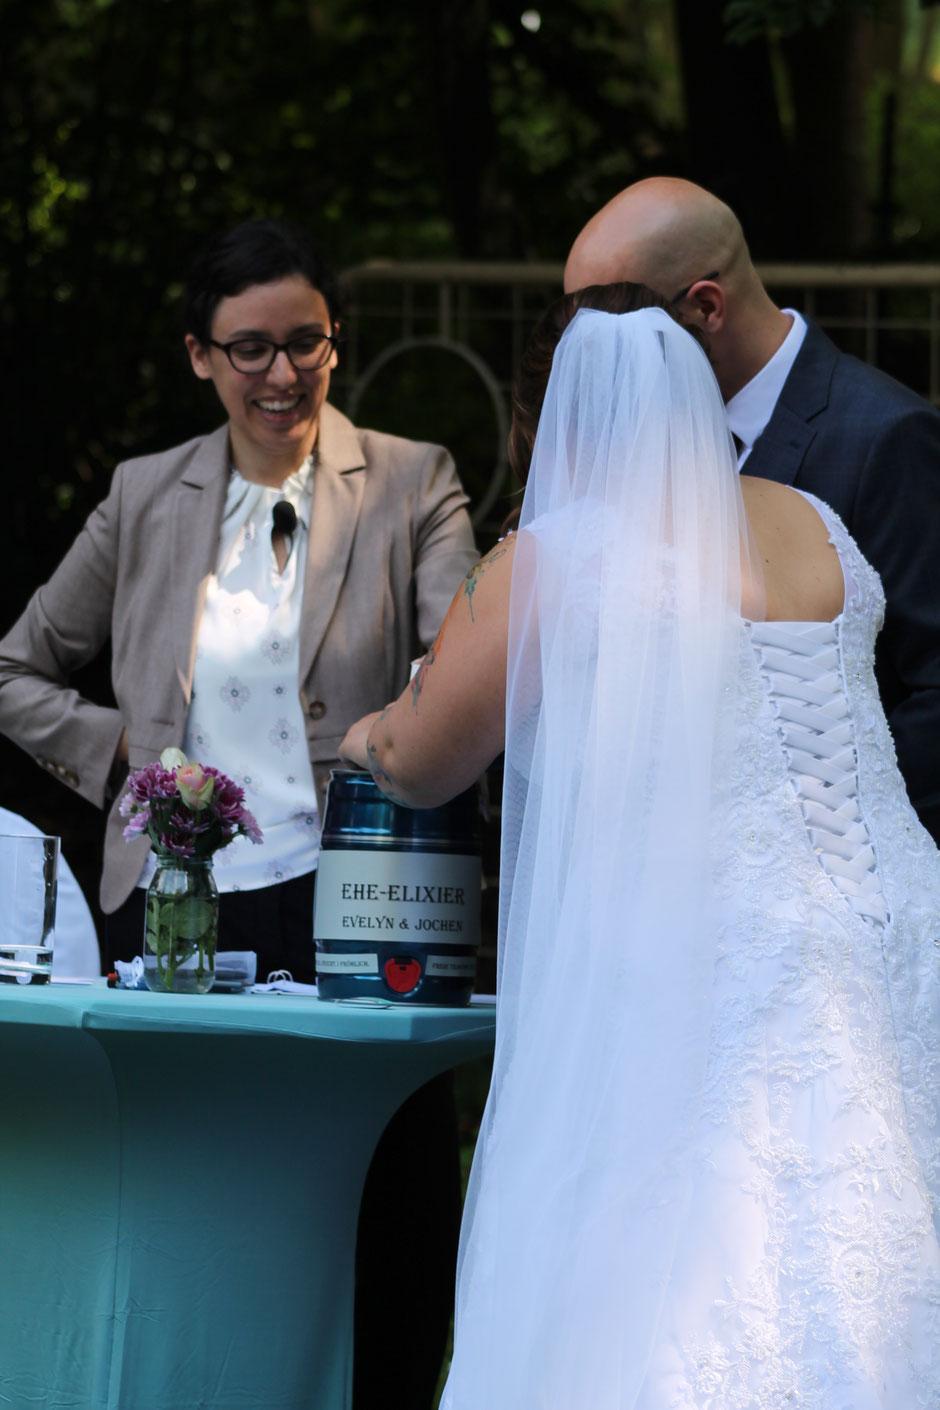 Ehe-Elixier-Fass als Ritual